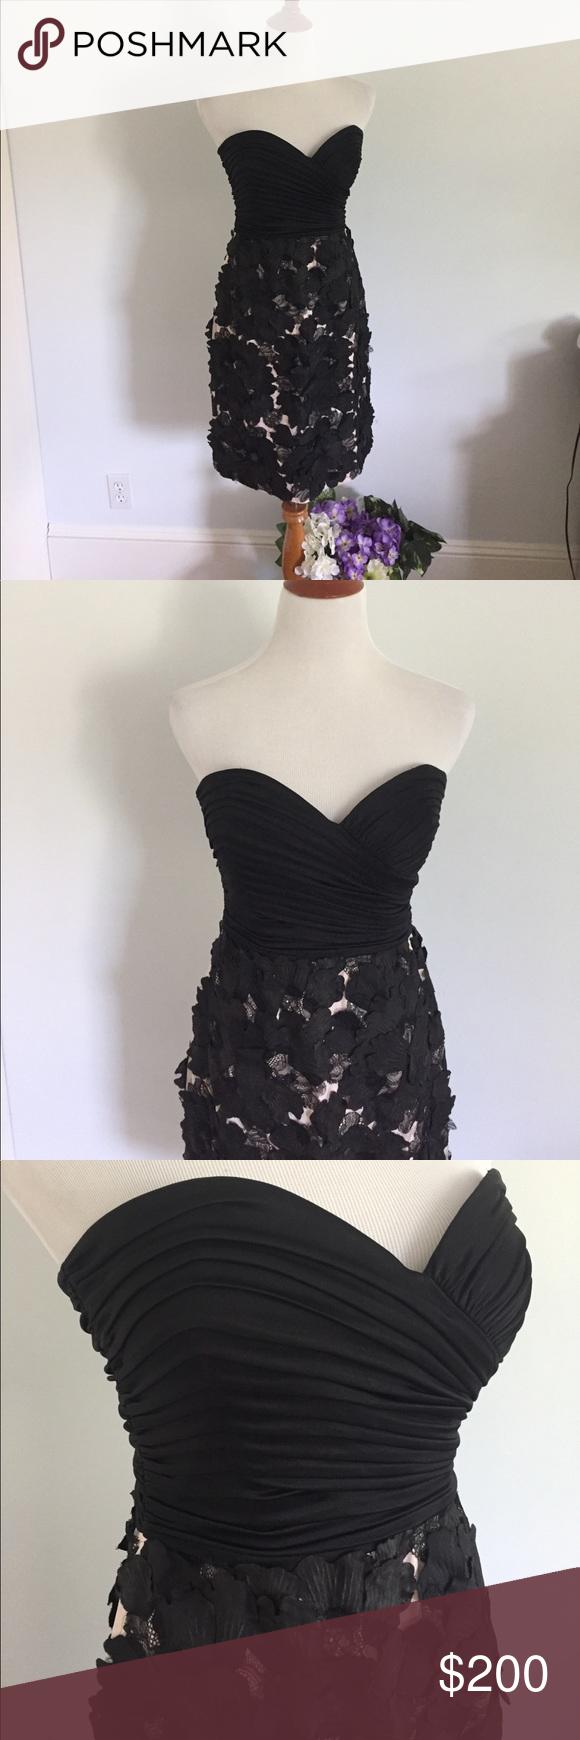 Strapless black dress with d floral skirt nwt strapless black